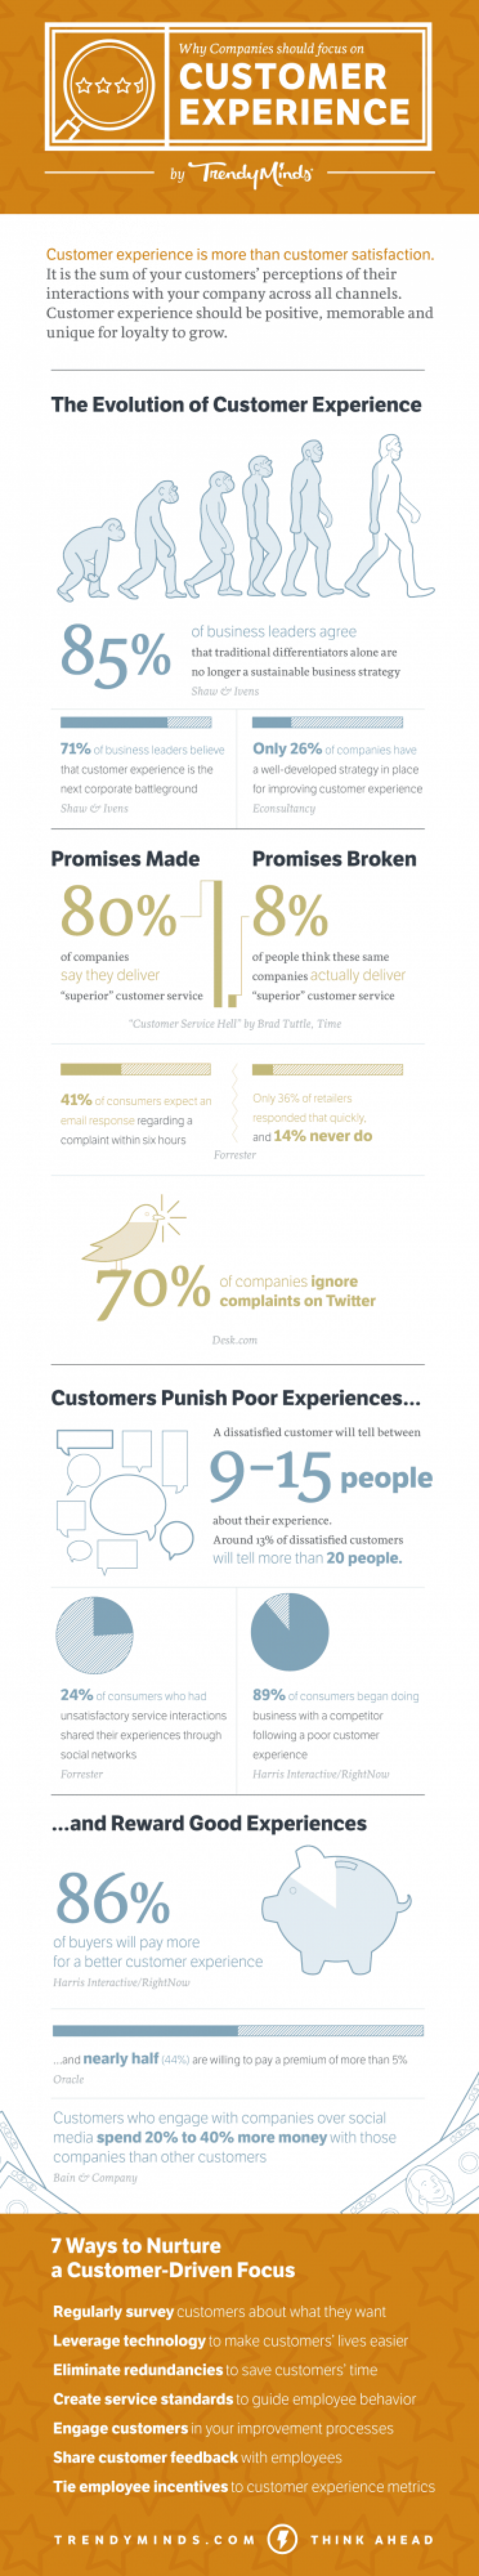 Celebrate Customer Experience